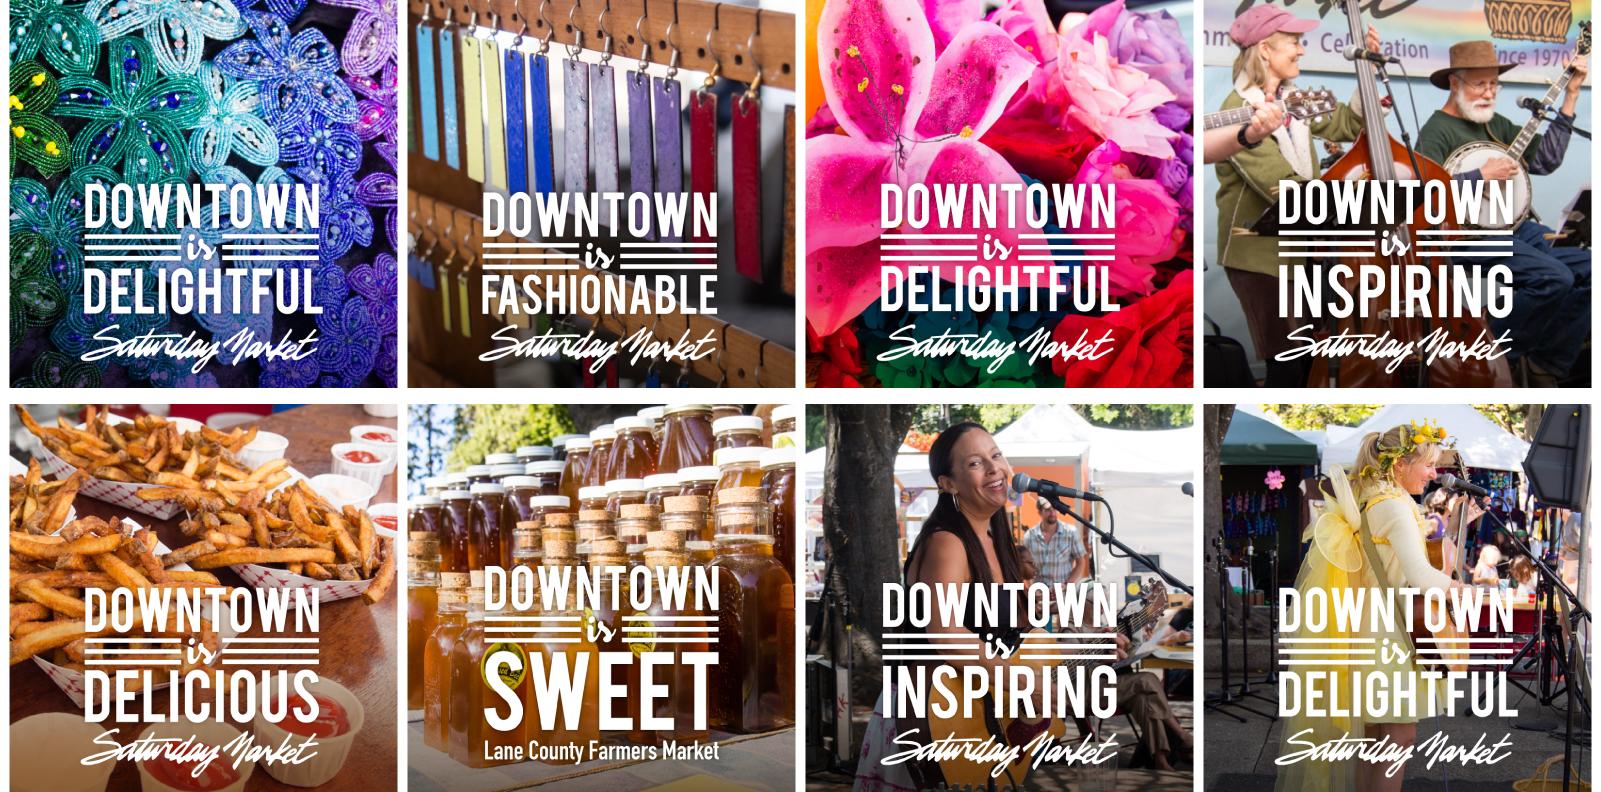 social media posts for downtown eugene merchants